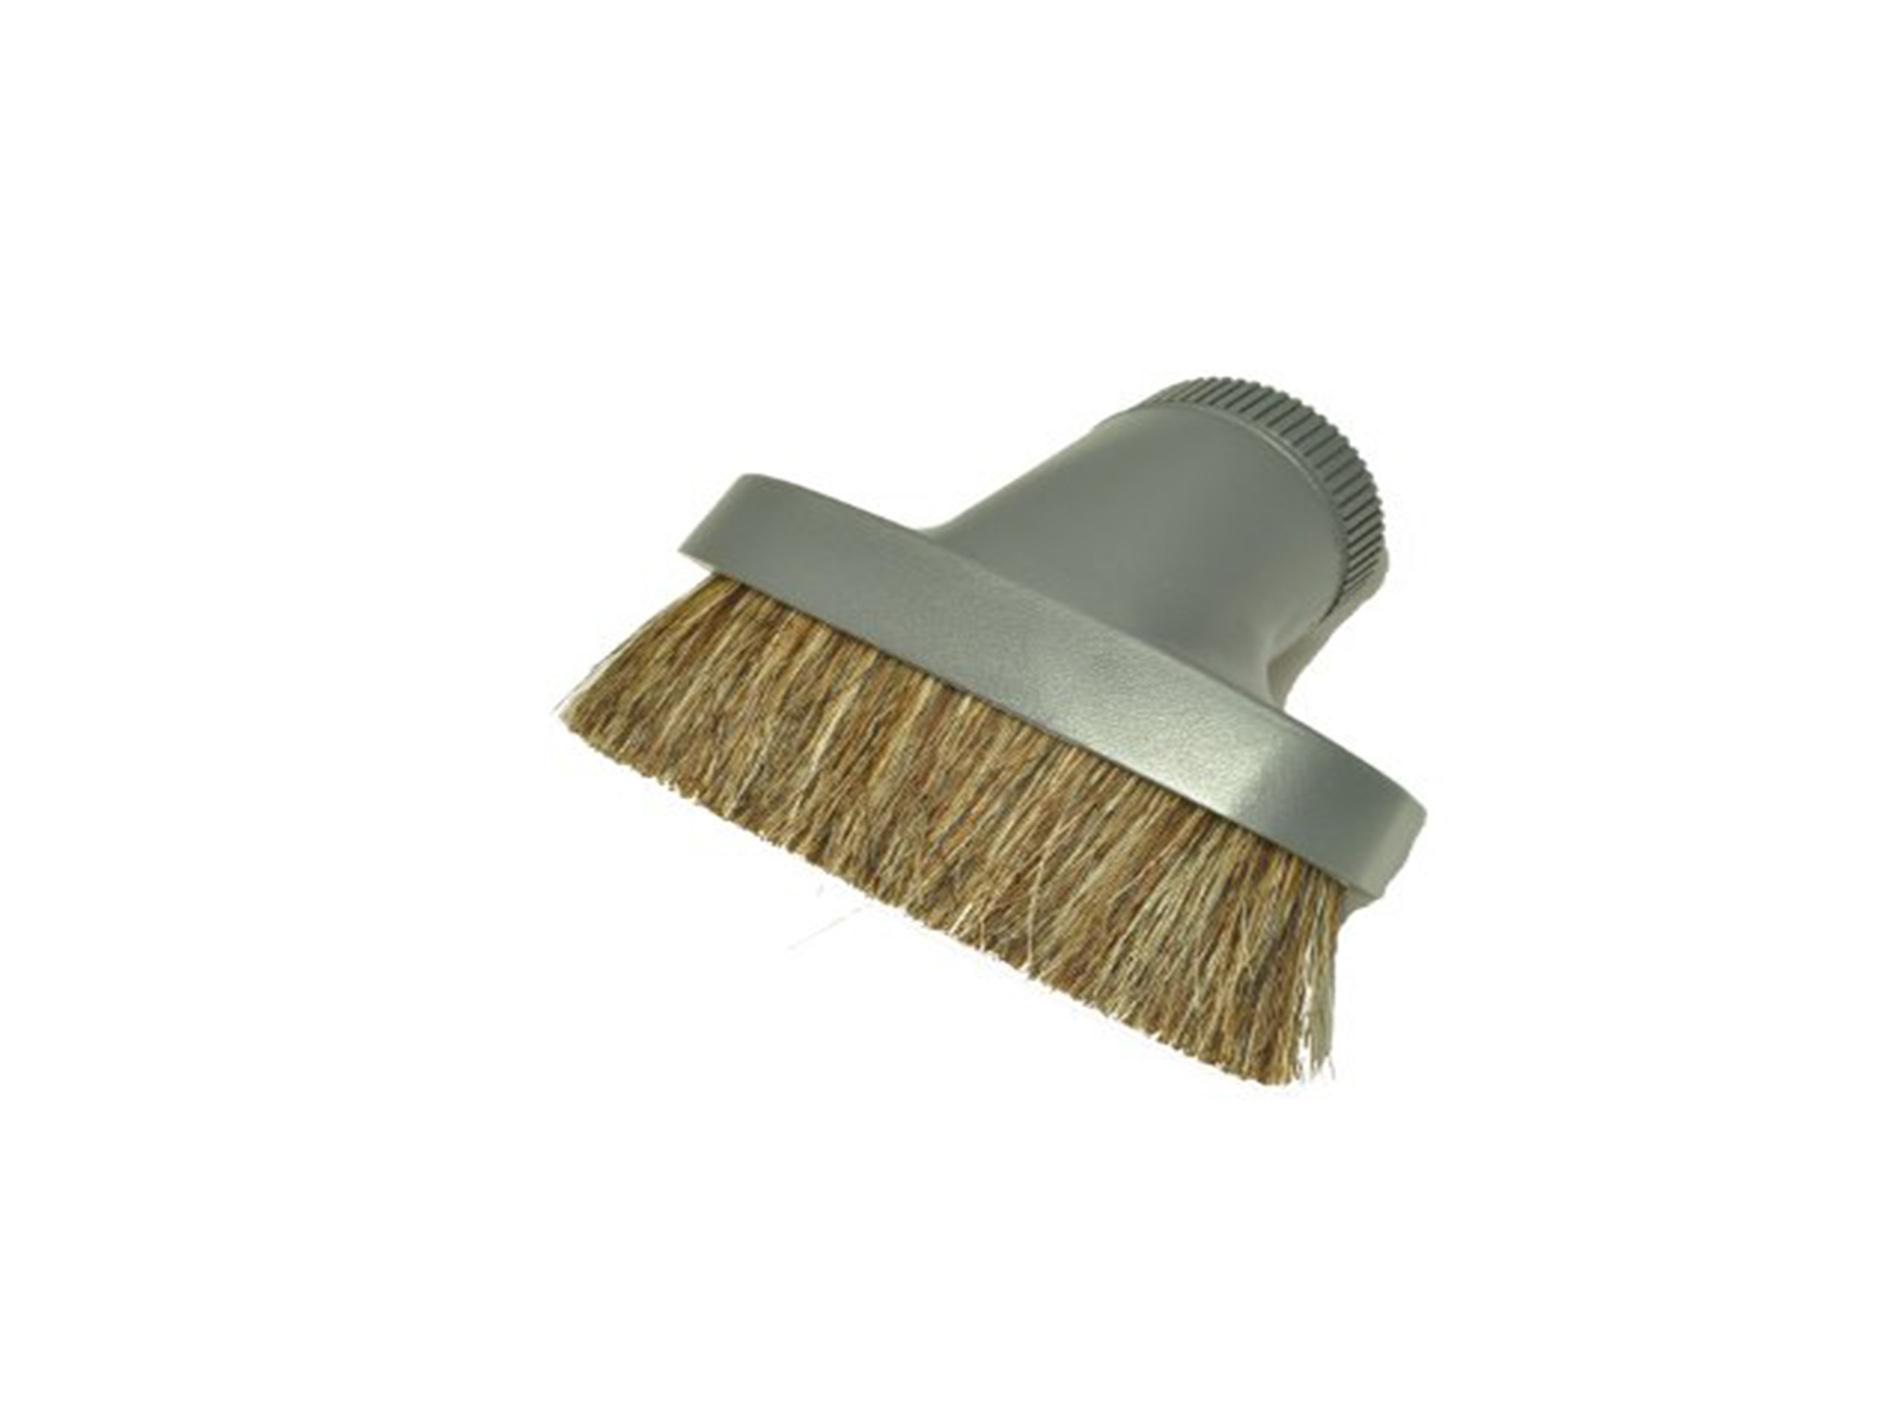 Kenmore Vacuum Dust Brush Cardy